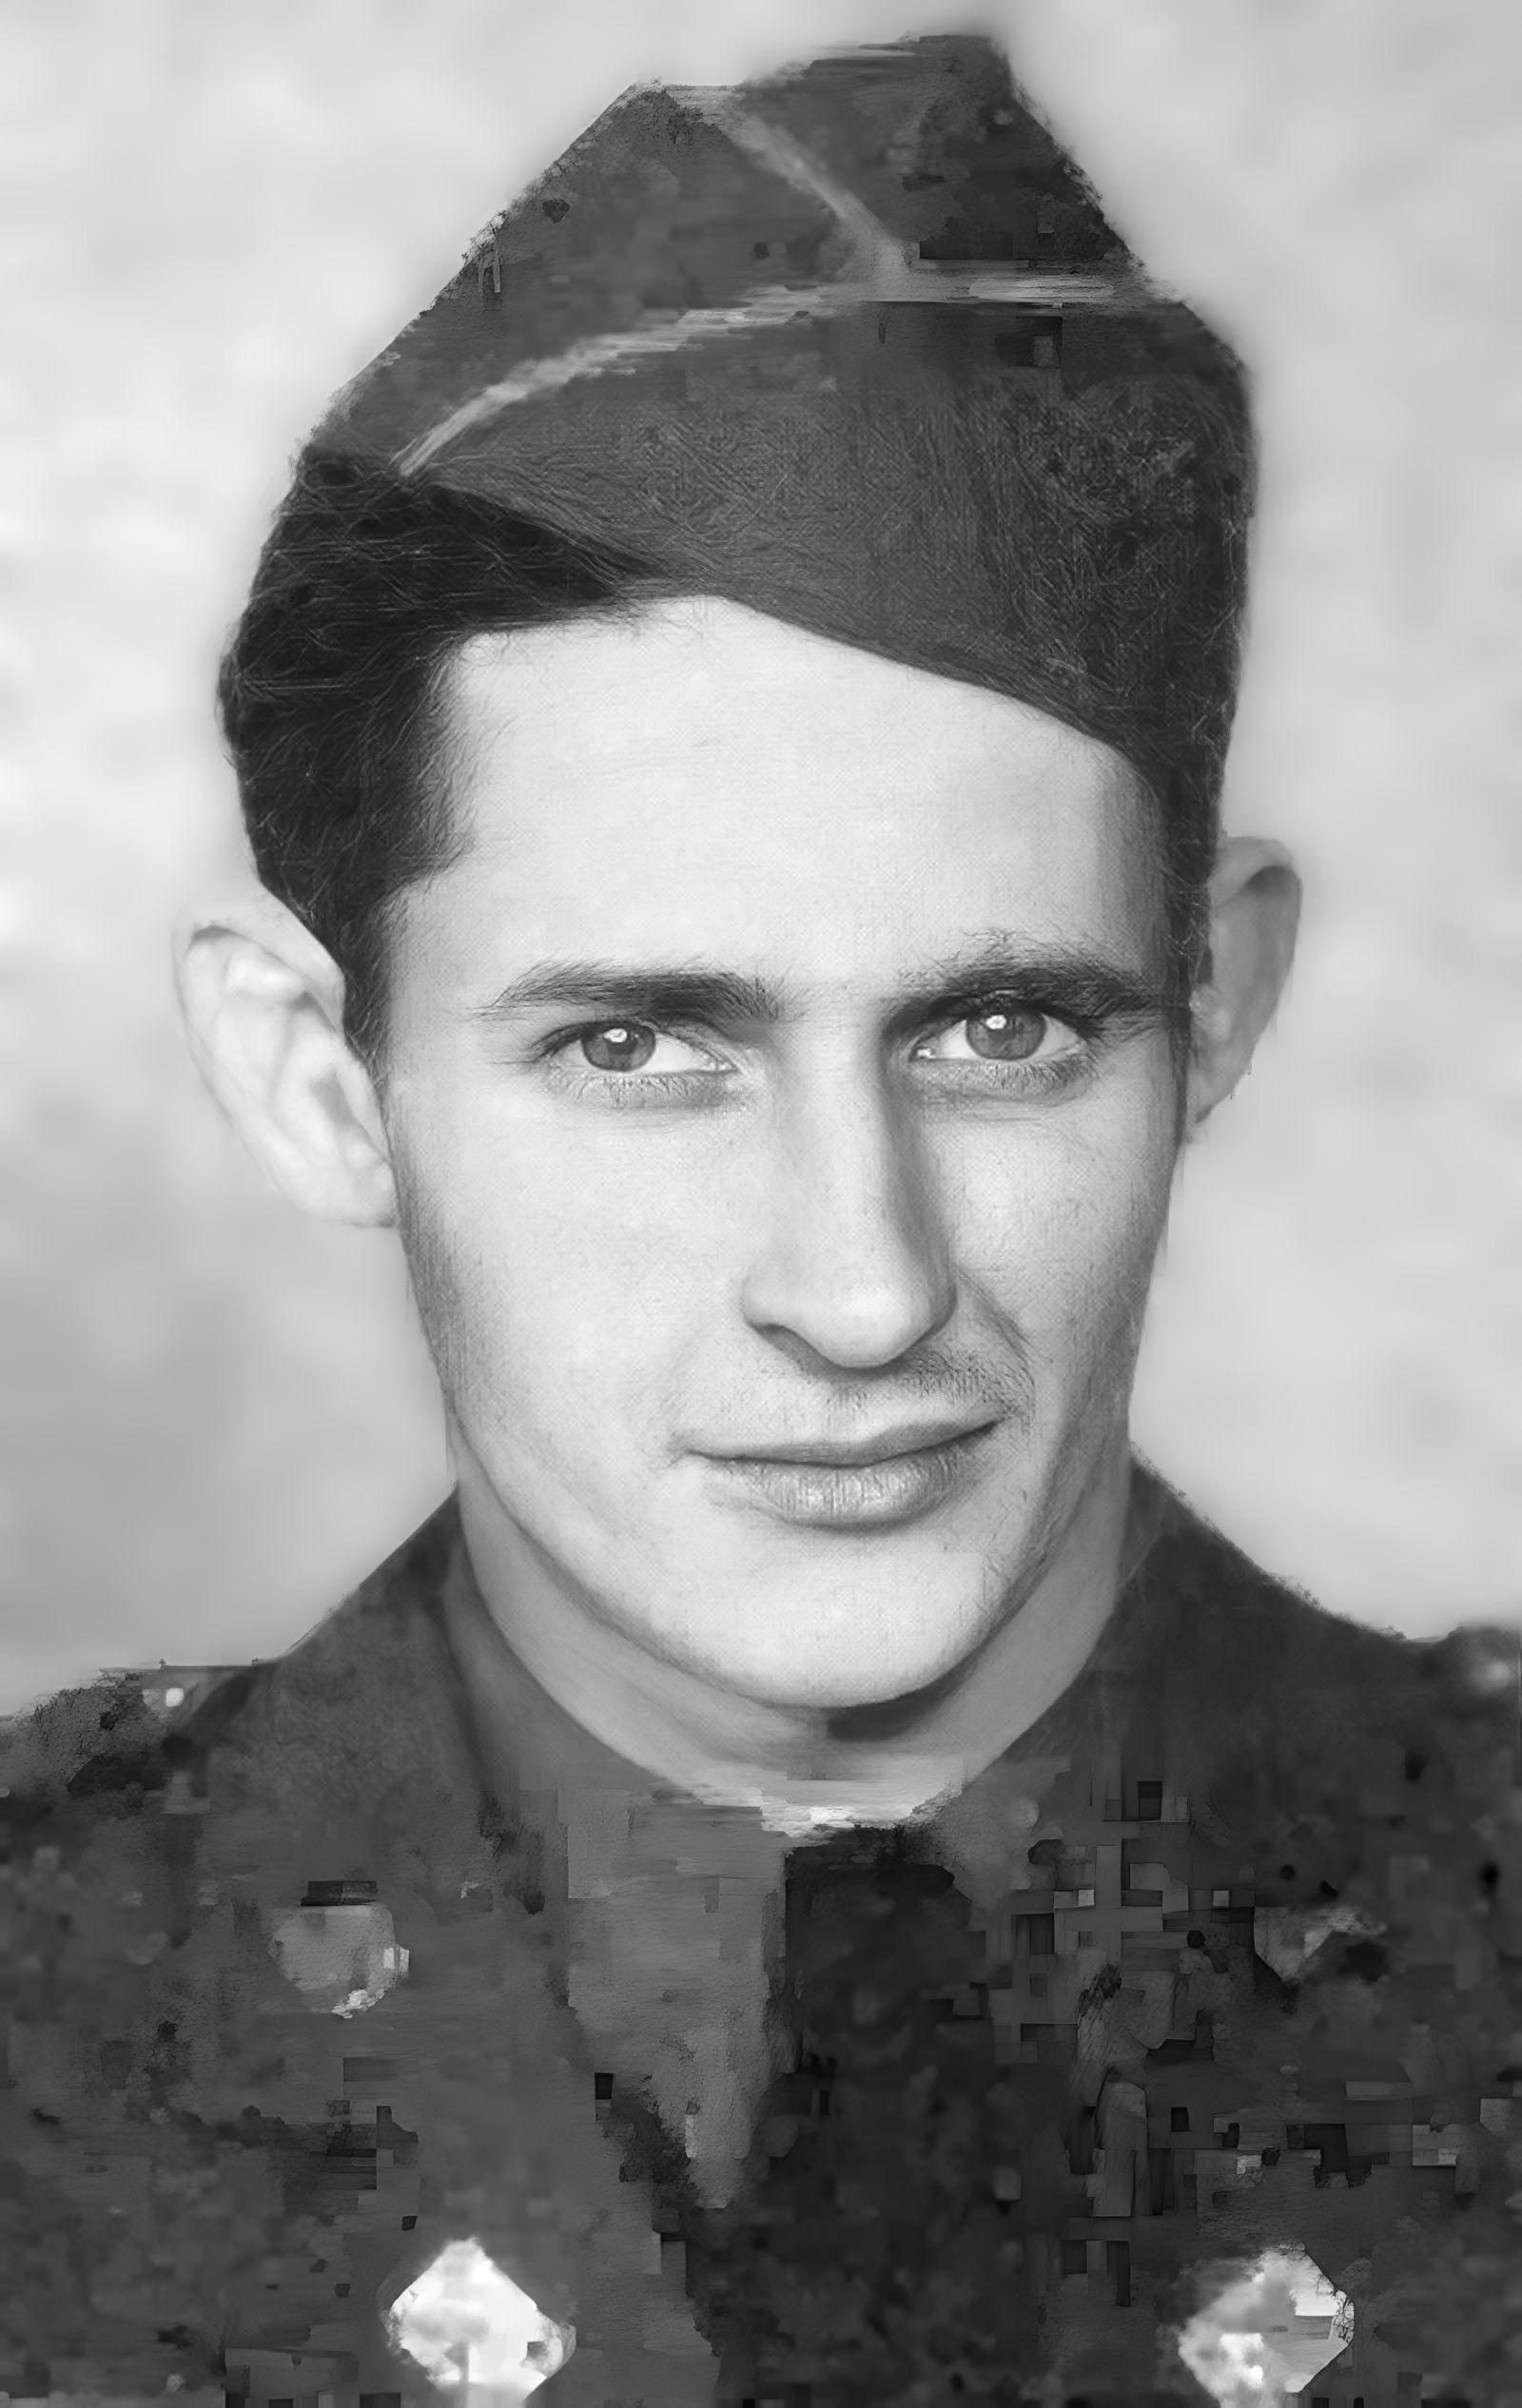 Joseph Mulvaney